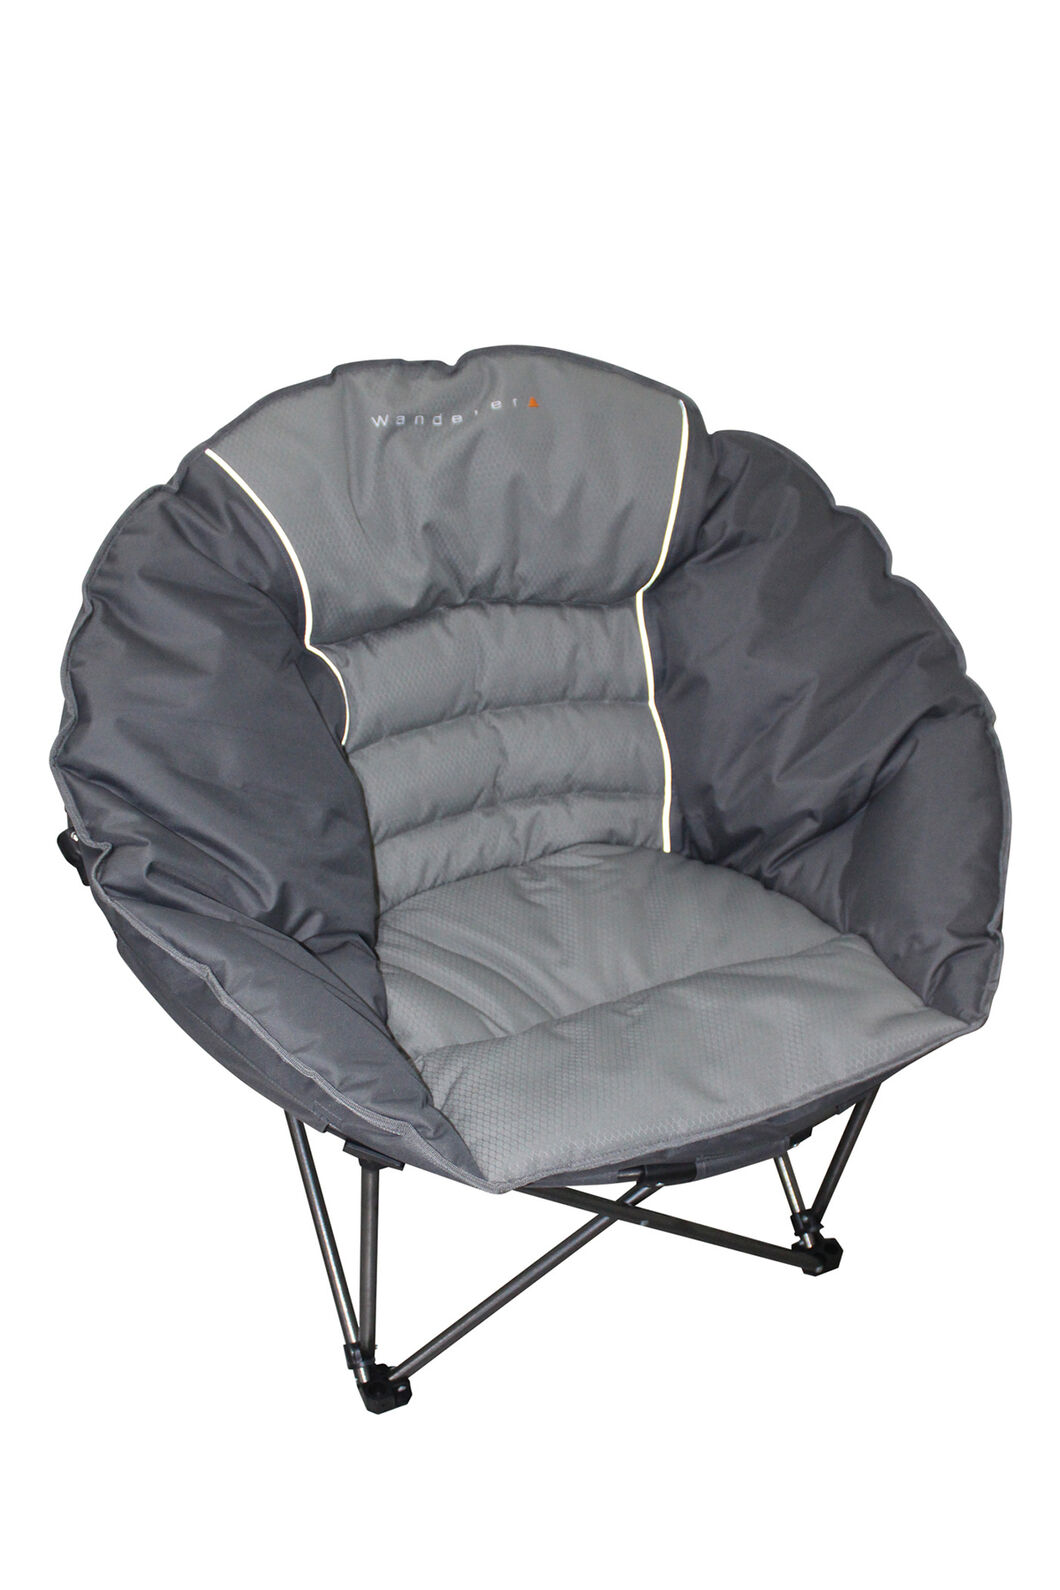 Wanderer Moon Quad Fold Chair, None, hi-res